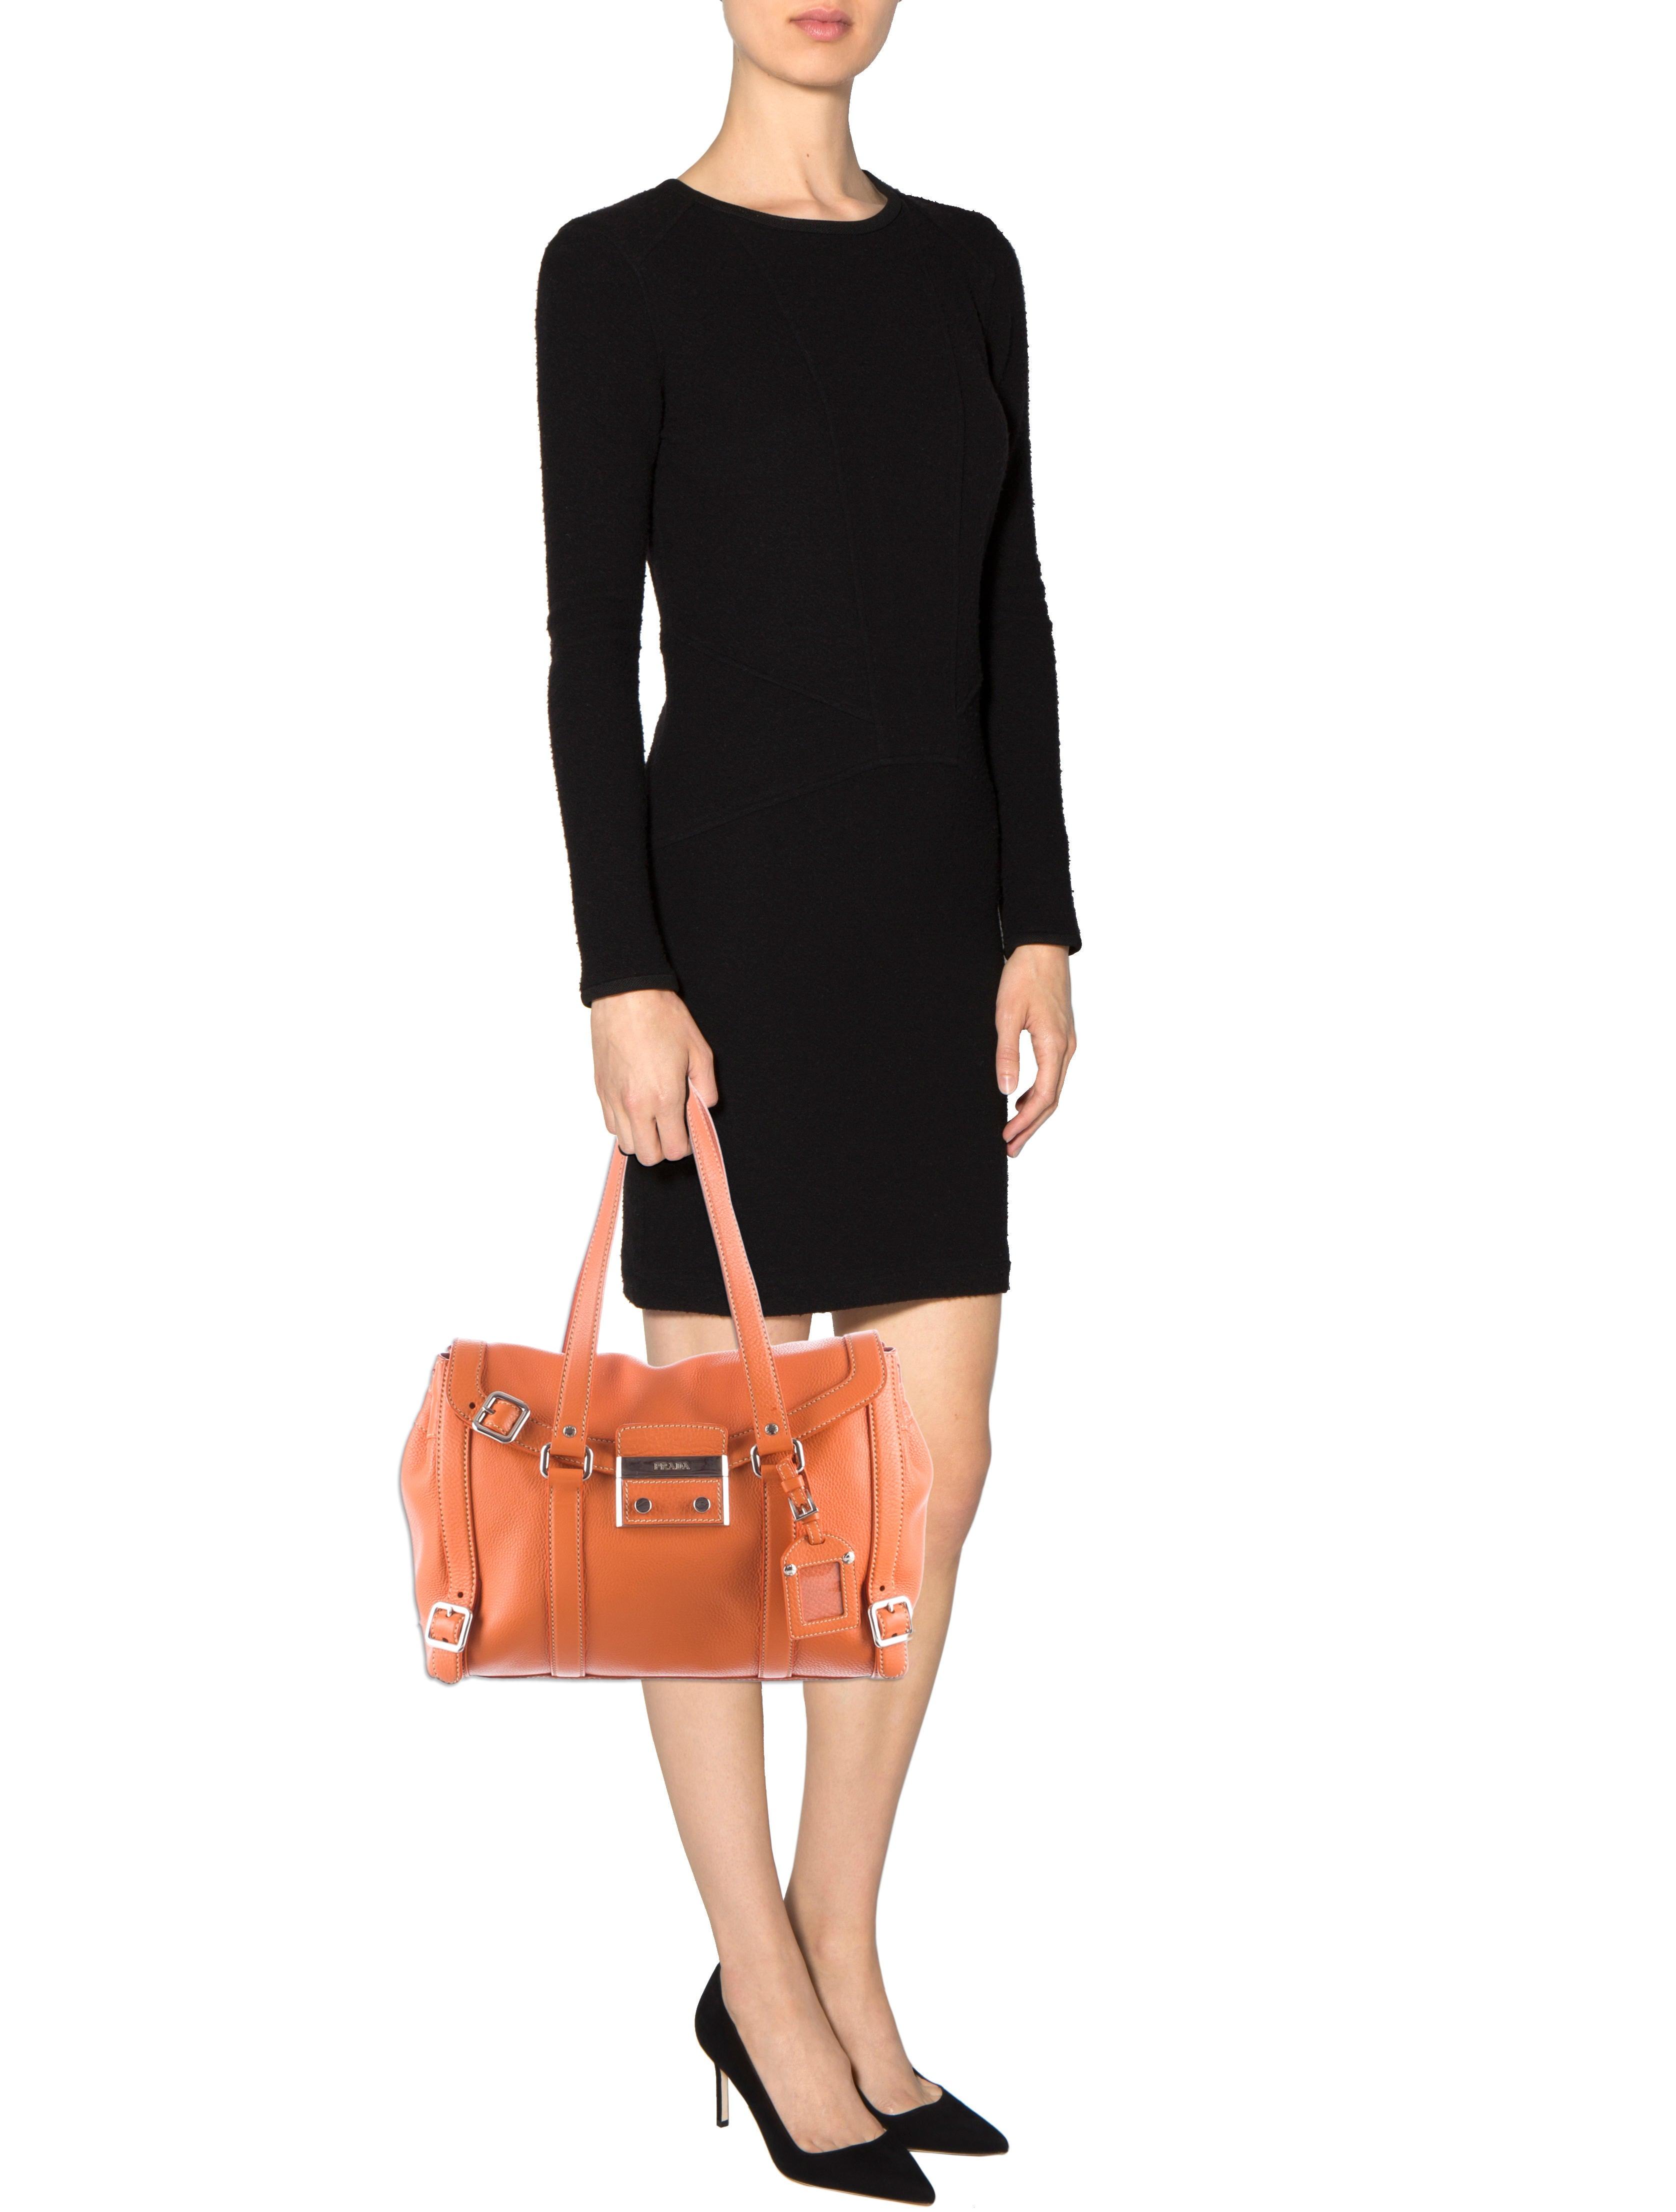 saffiano leather tote price - prada vitello shoulder bag, black and white prada handbags